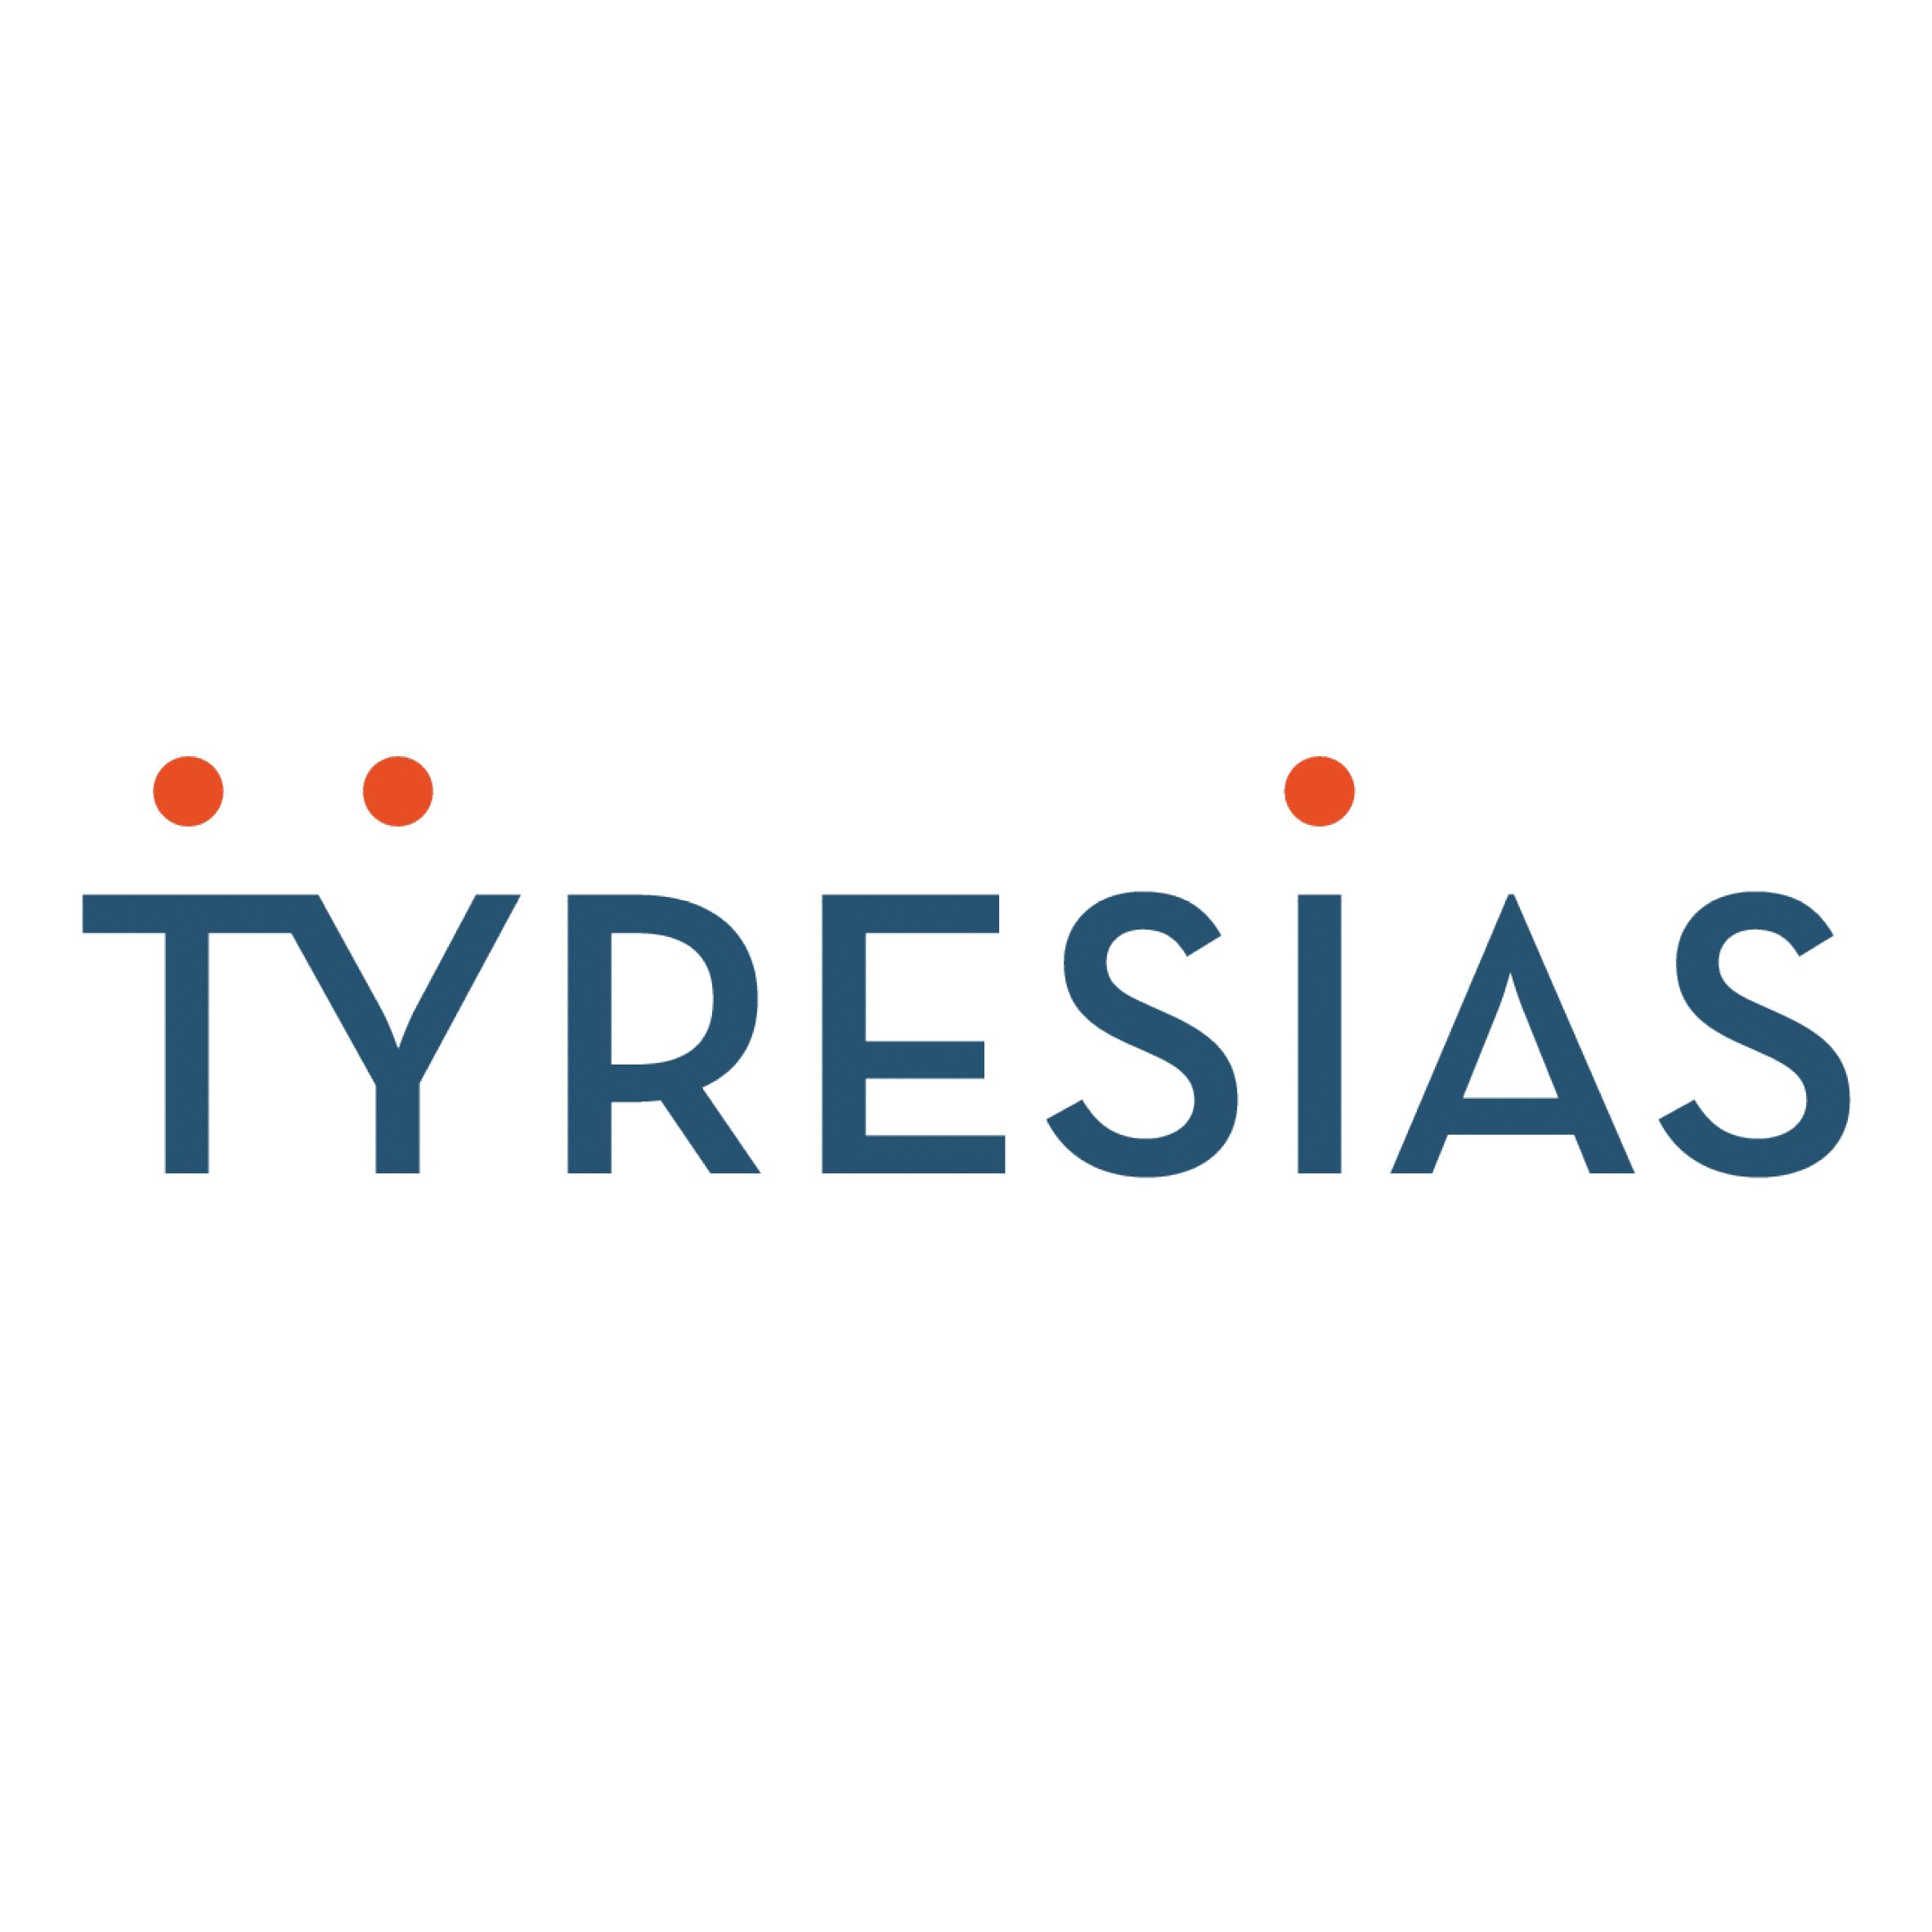 Tyresias